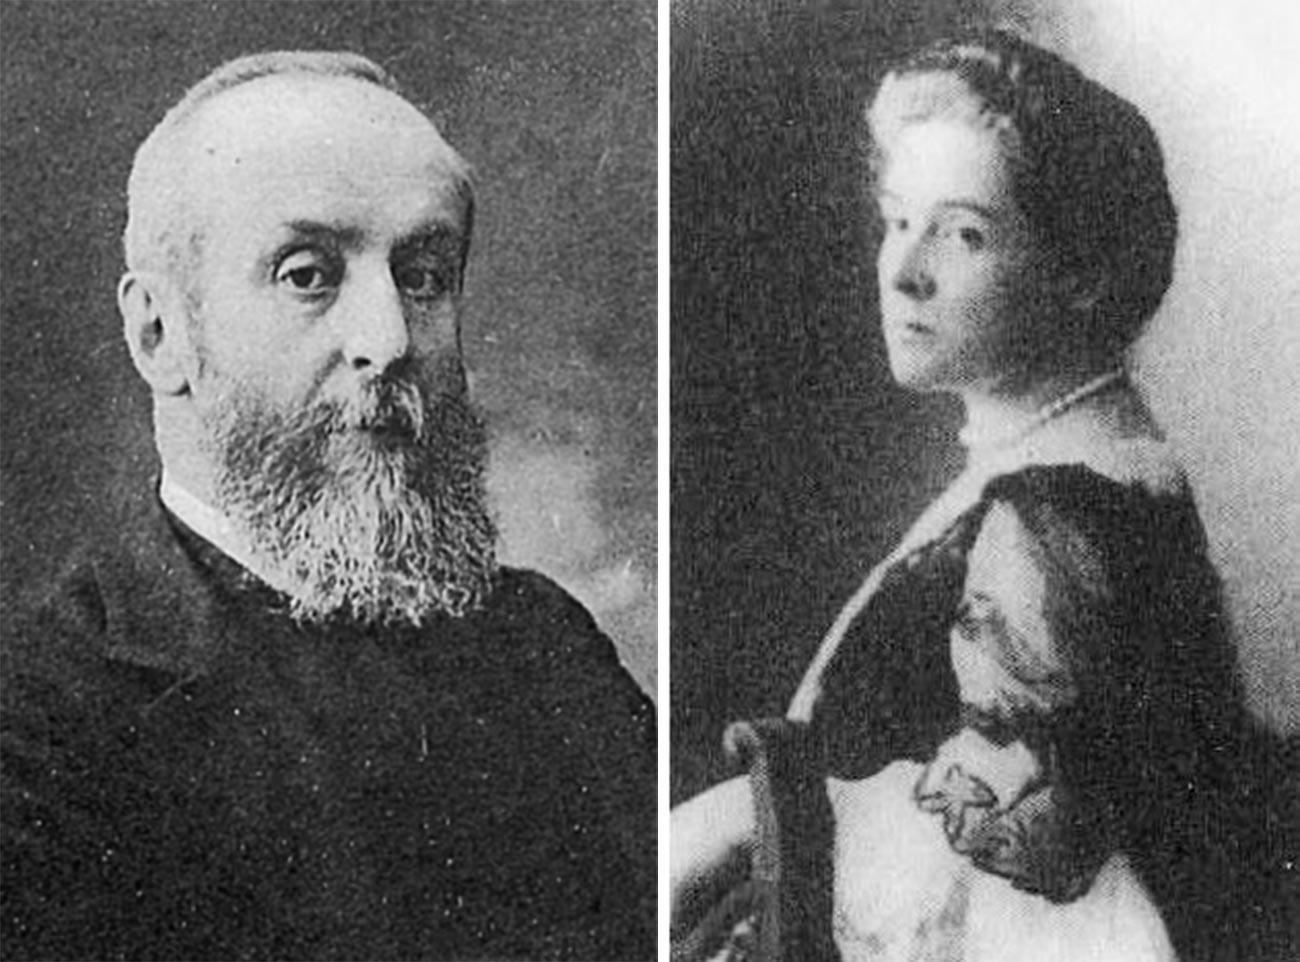 Aleksandr Bobrinbskiy dan Nadezhda Bobrinskaya, orang tua Sofia.